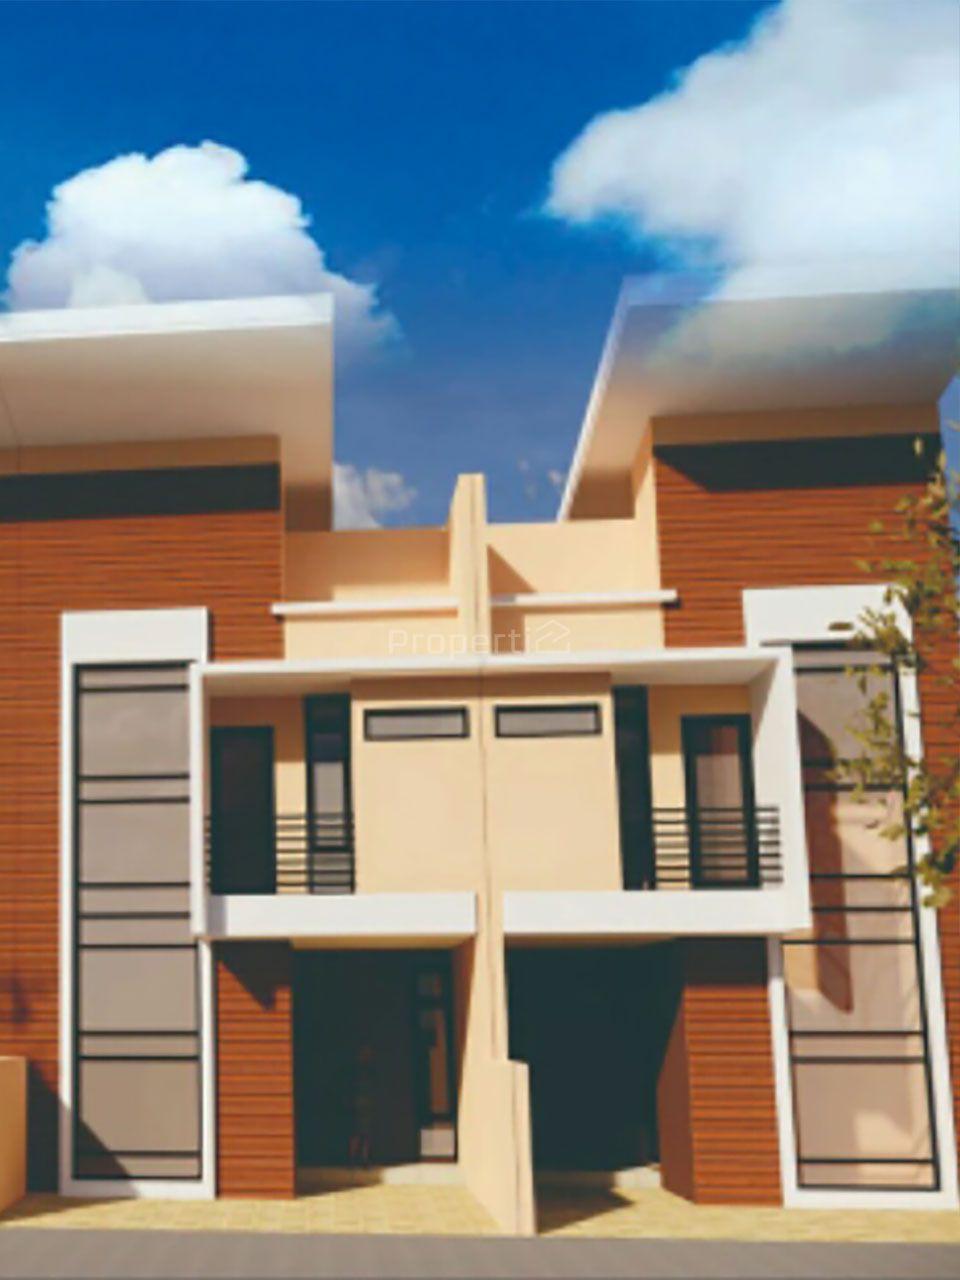 Rumah Kost Modern Renjana Cemerlang Village di Jetis, Malang, Jawa Timur